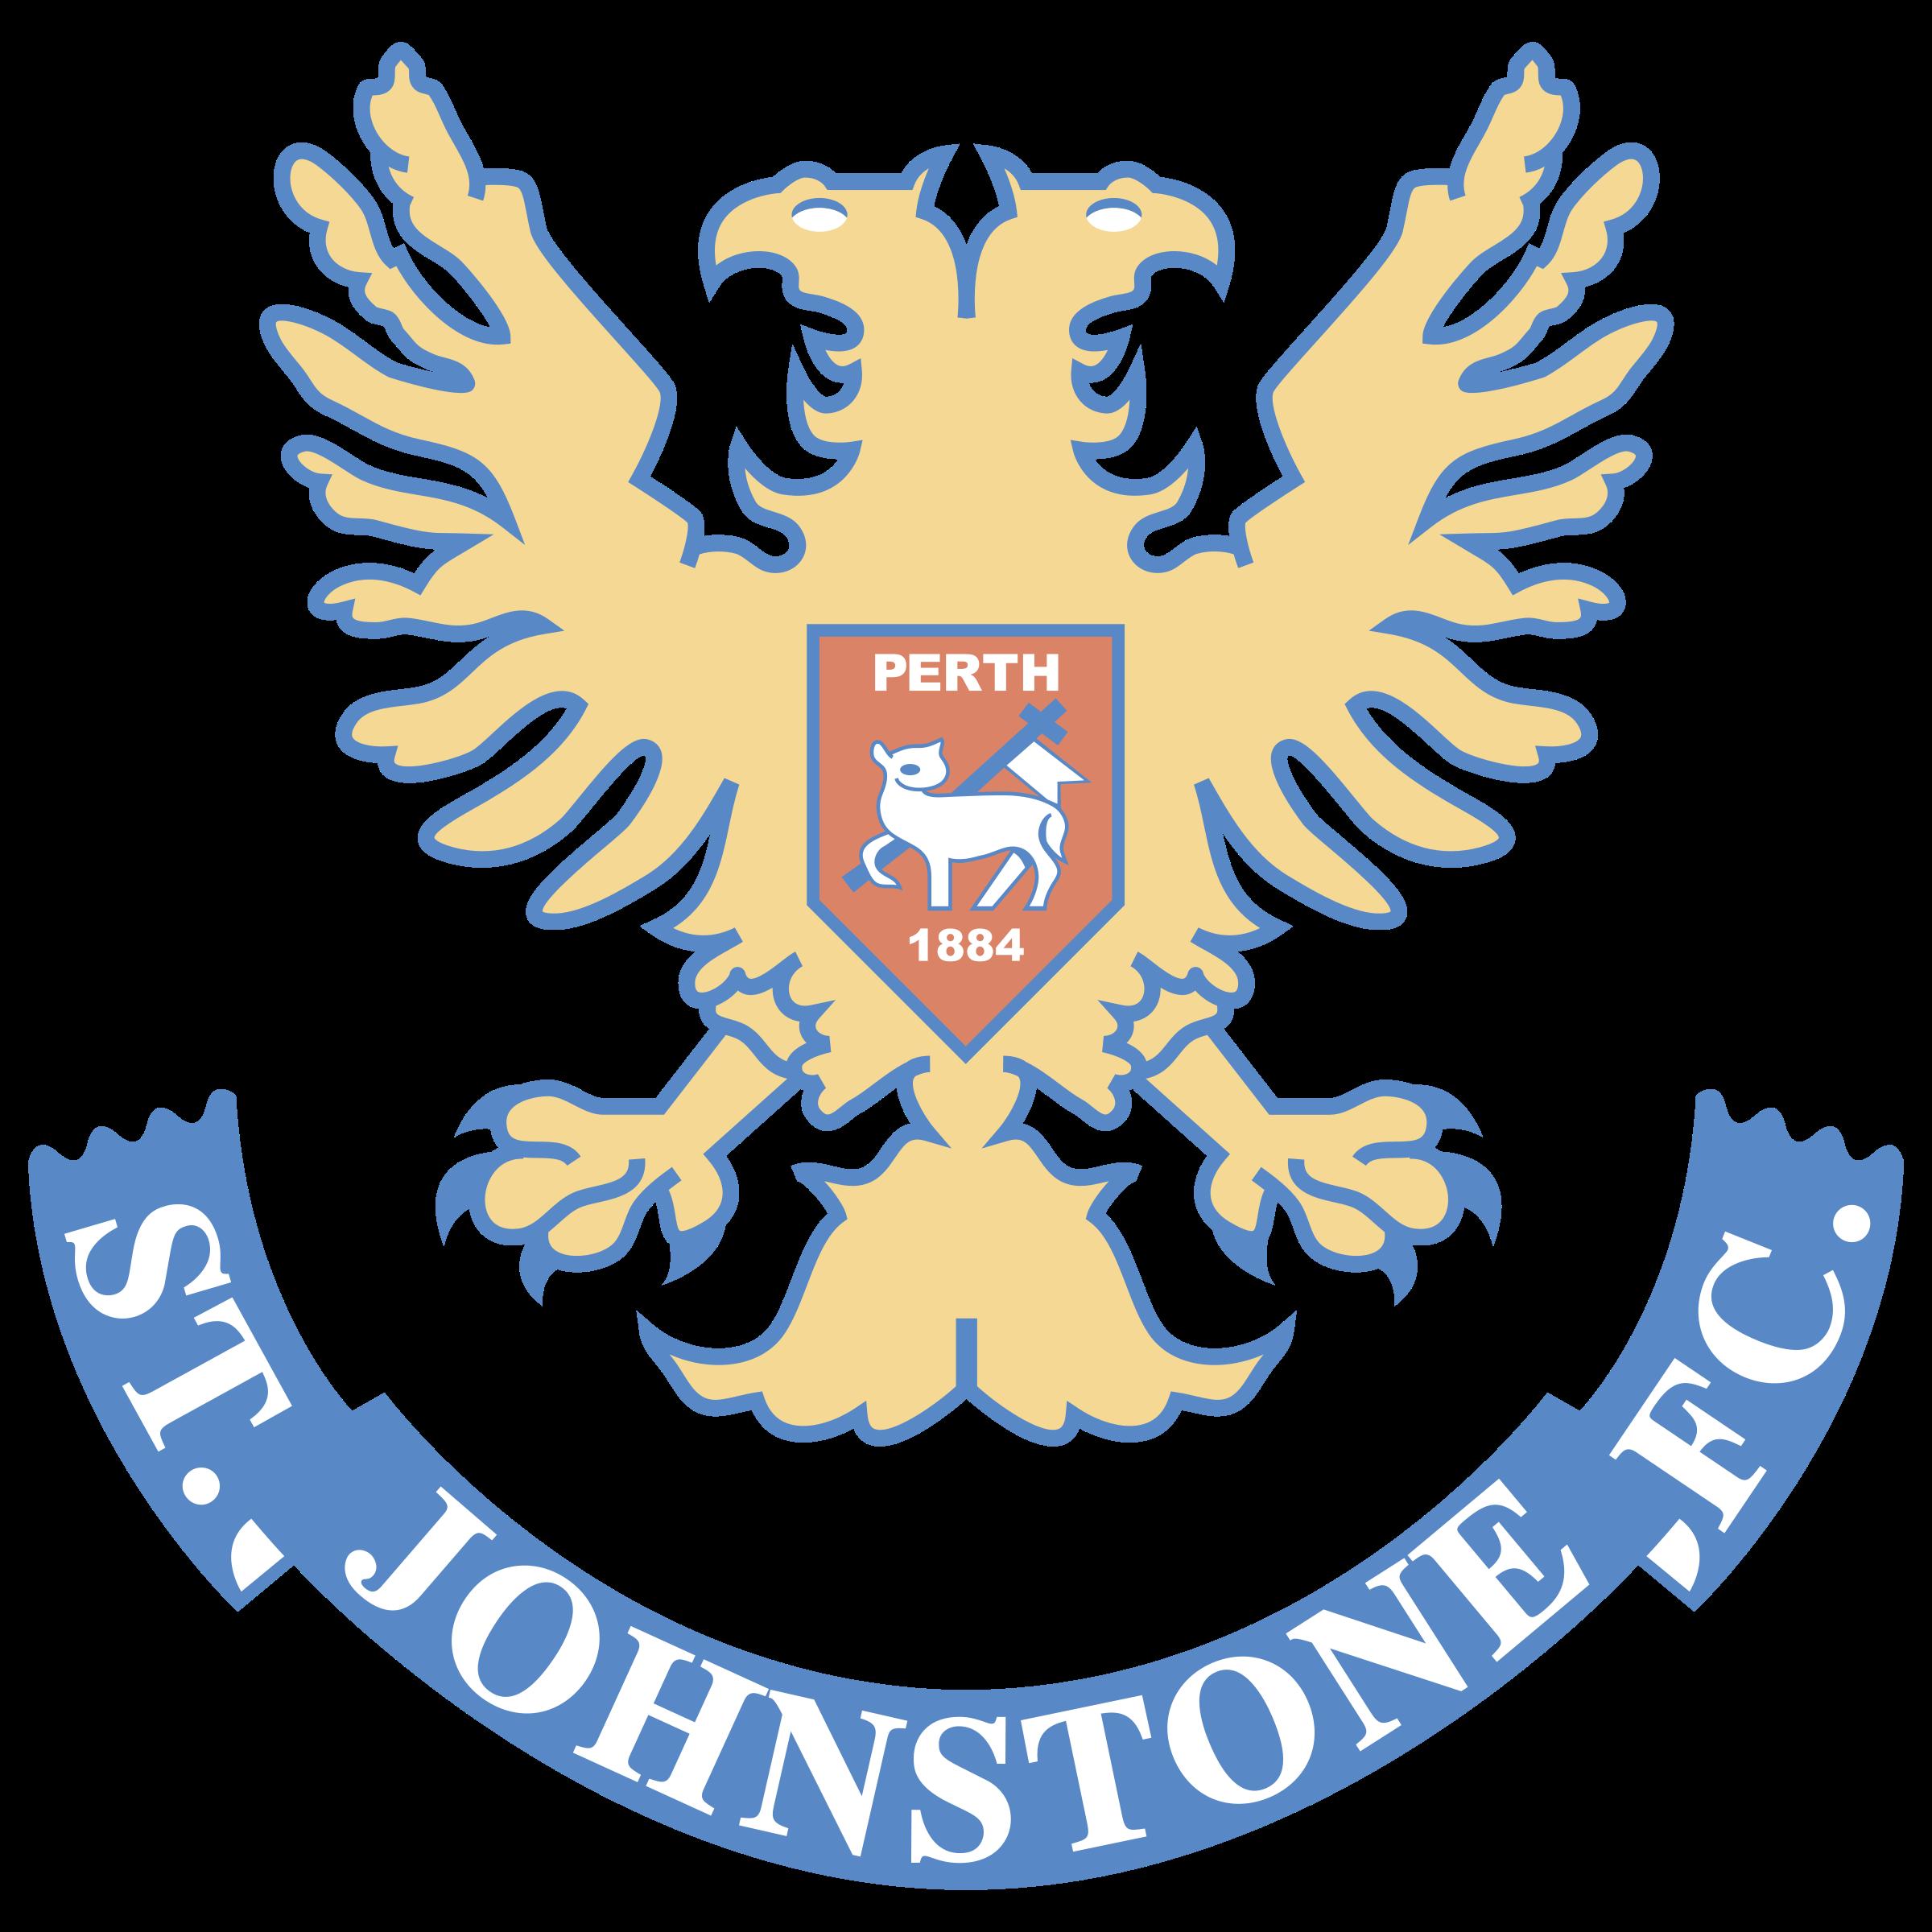 st johnstone - photo #4